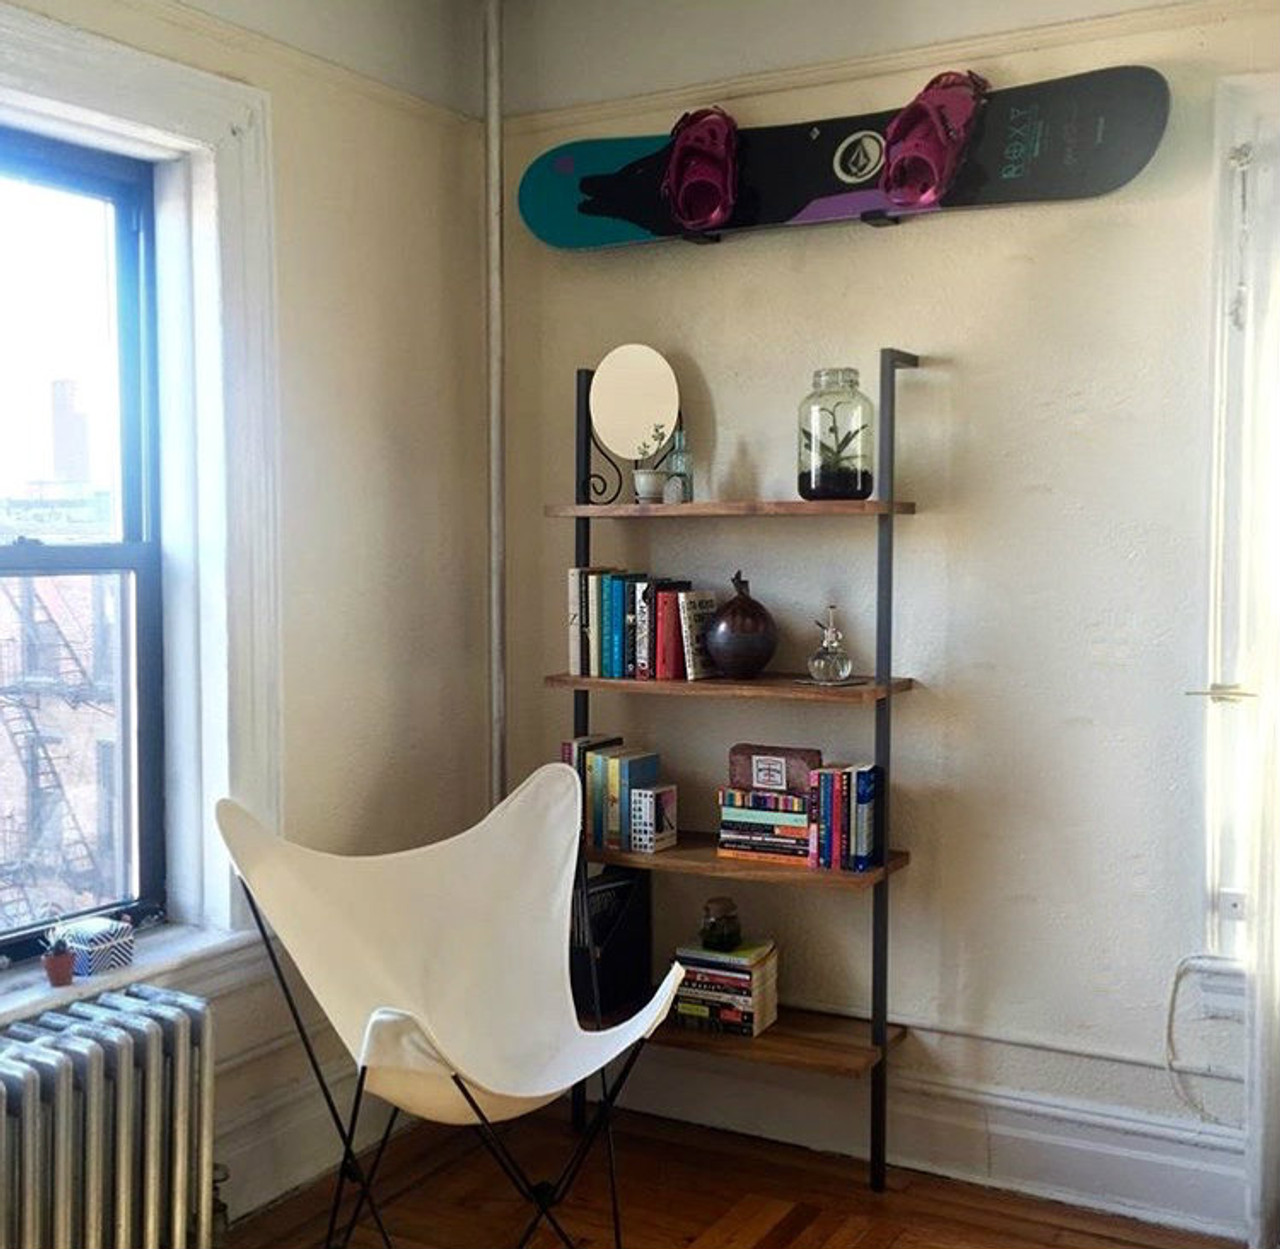 Naked Snow  Minimalist Snowboard Rack - Storeyourboardcom-9120